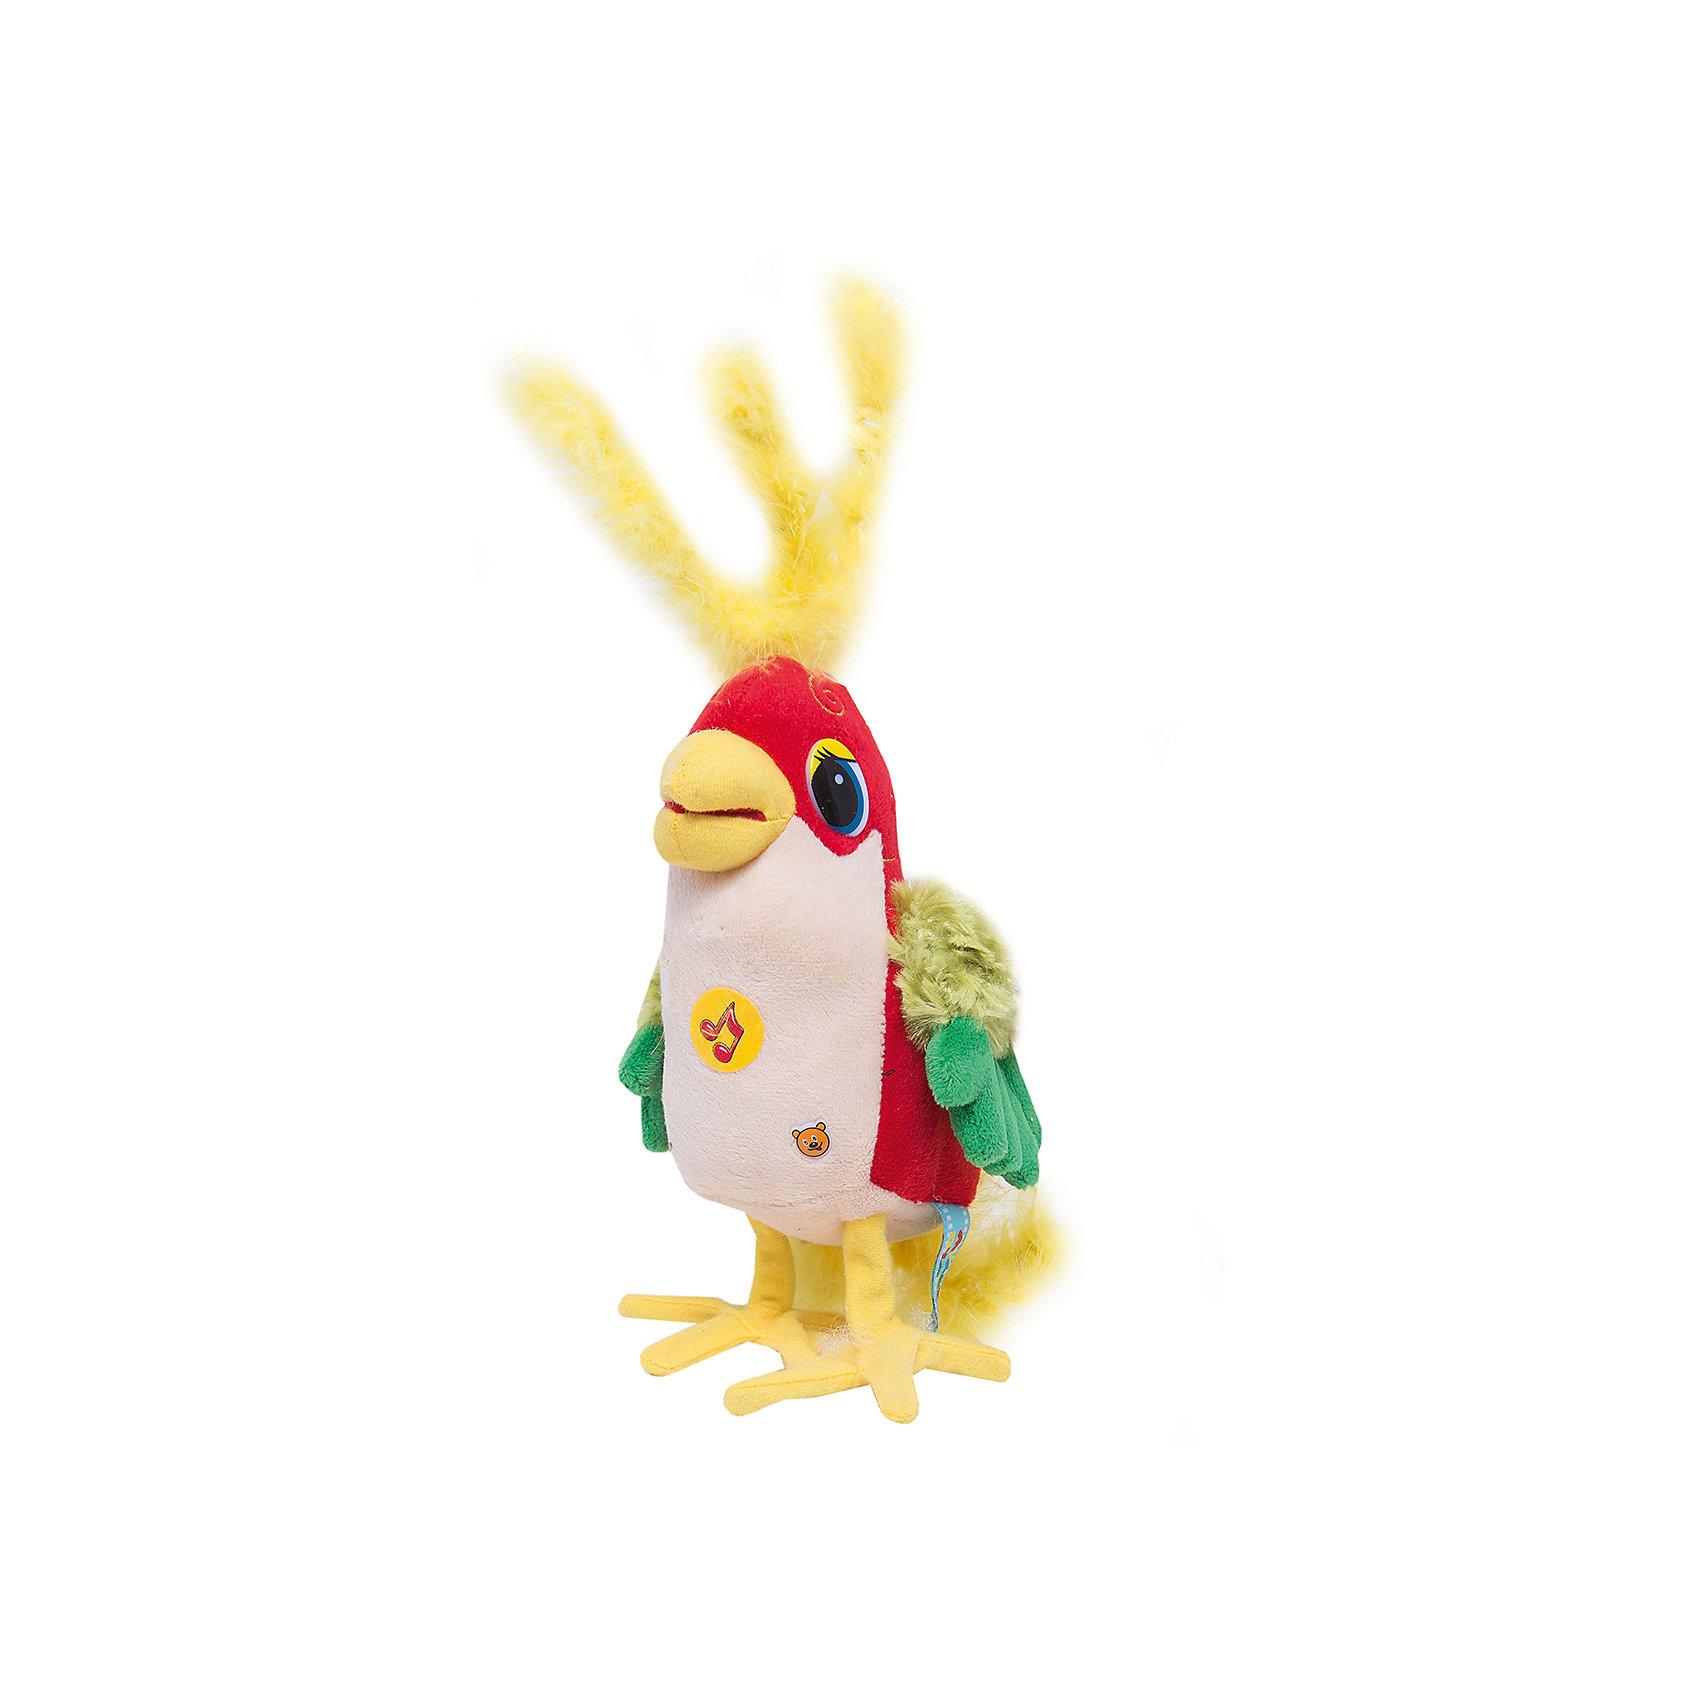 МУЛЬТИ-ПУЛЬТИ Мягкая игрушка Попугай, 20 см, 38 попугаев, МУЛЬТИ-ПУЛЬТИ мульти пульти мягкая игрушка крокодильчик свомпи where is my water со звуком 20 см мульти пульти